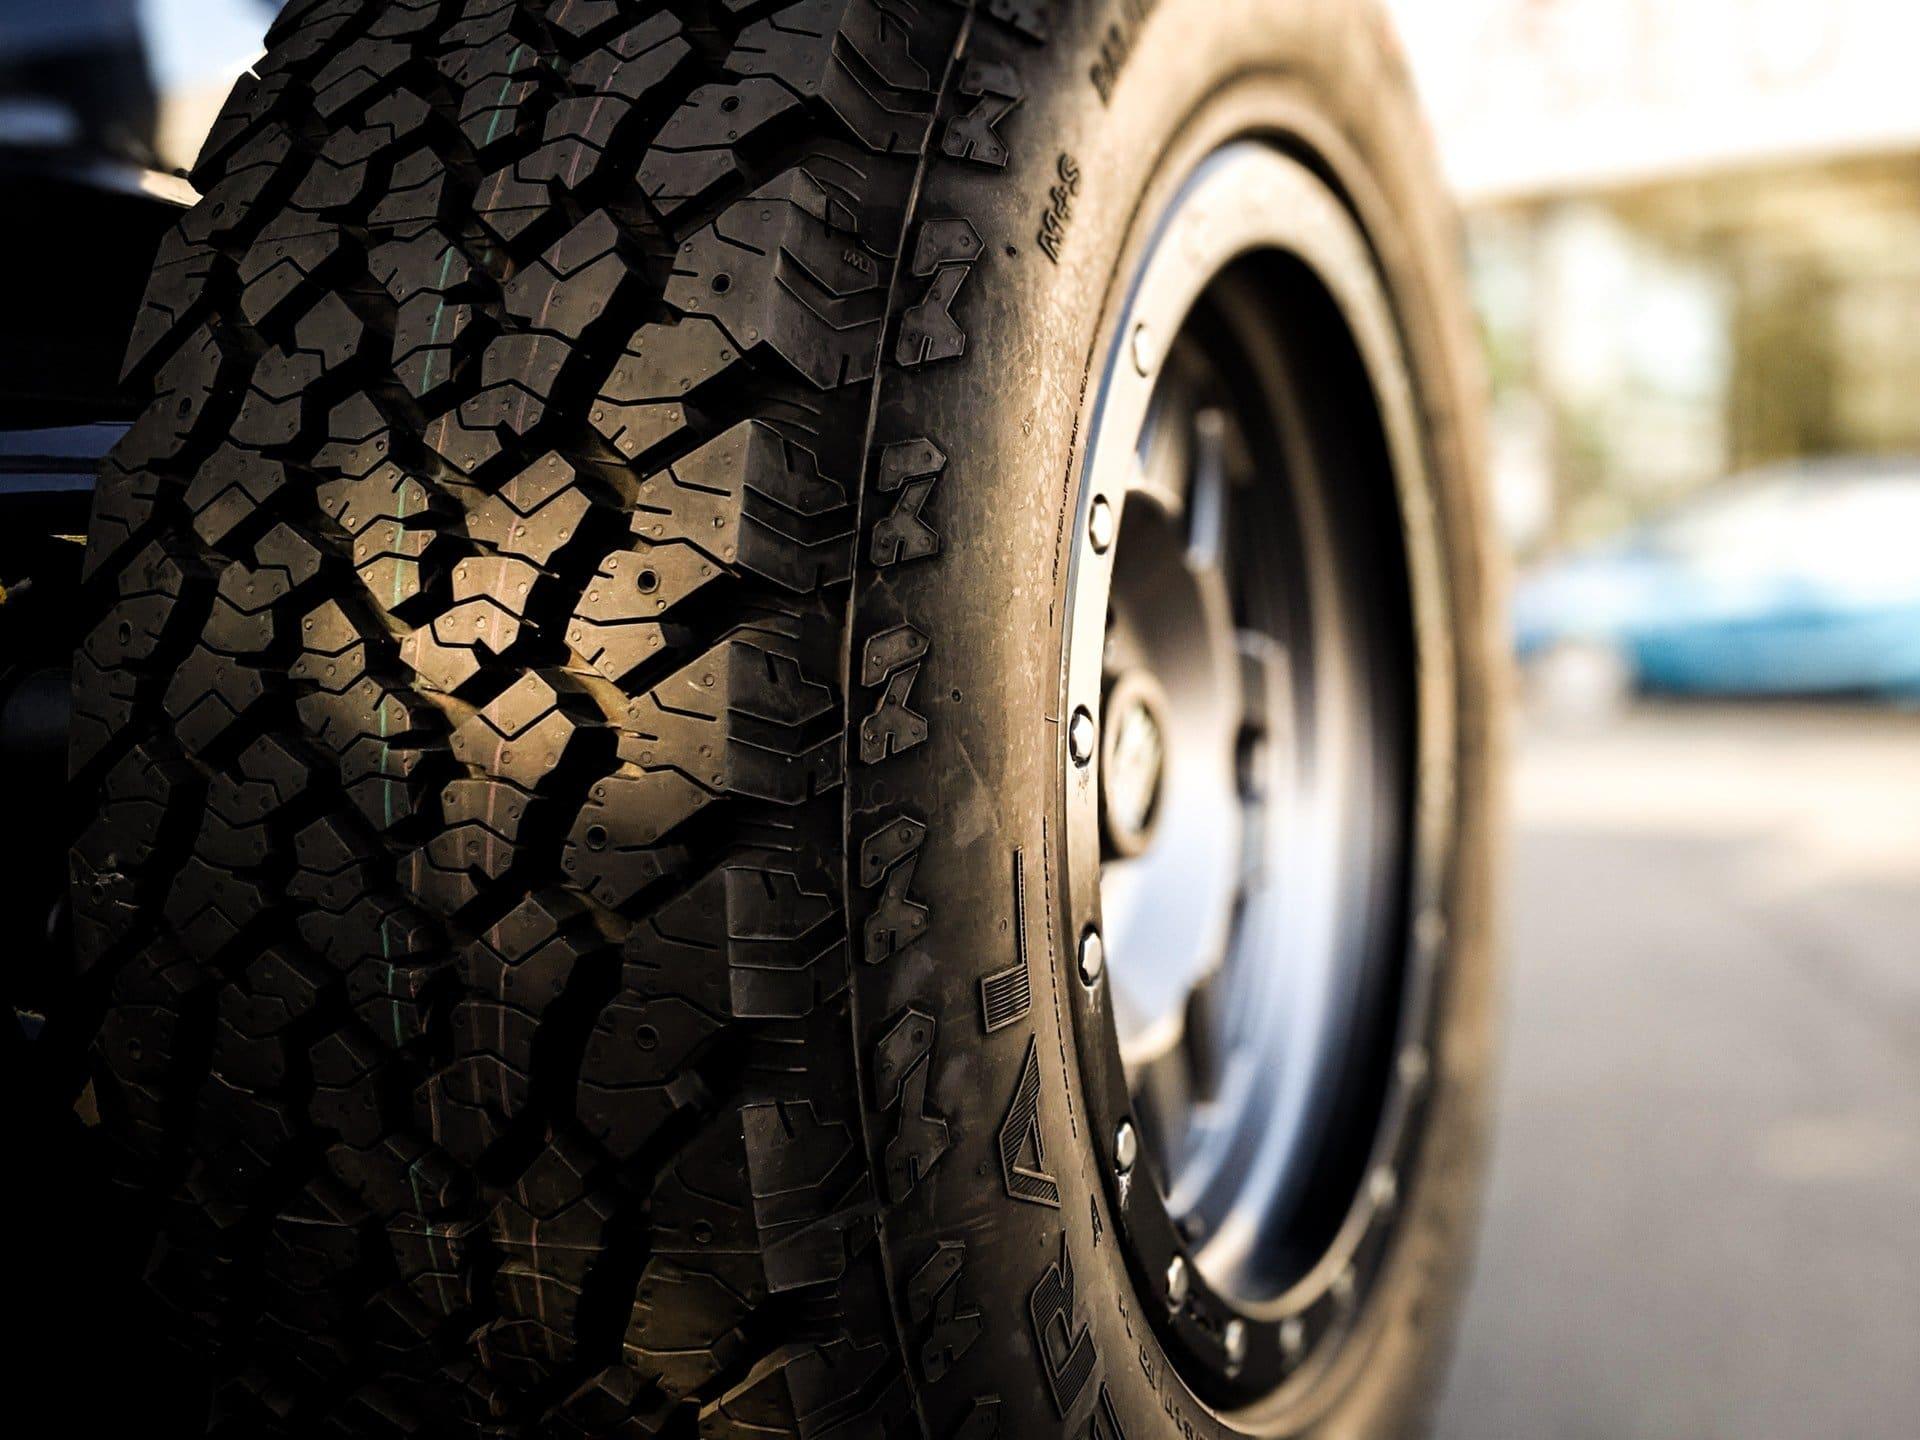 Best Tires for Chevy Silverado 1500 Trucks: Top 2021 Picks